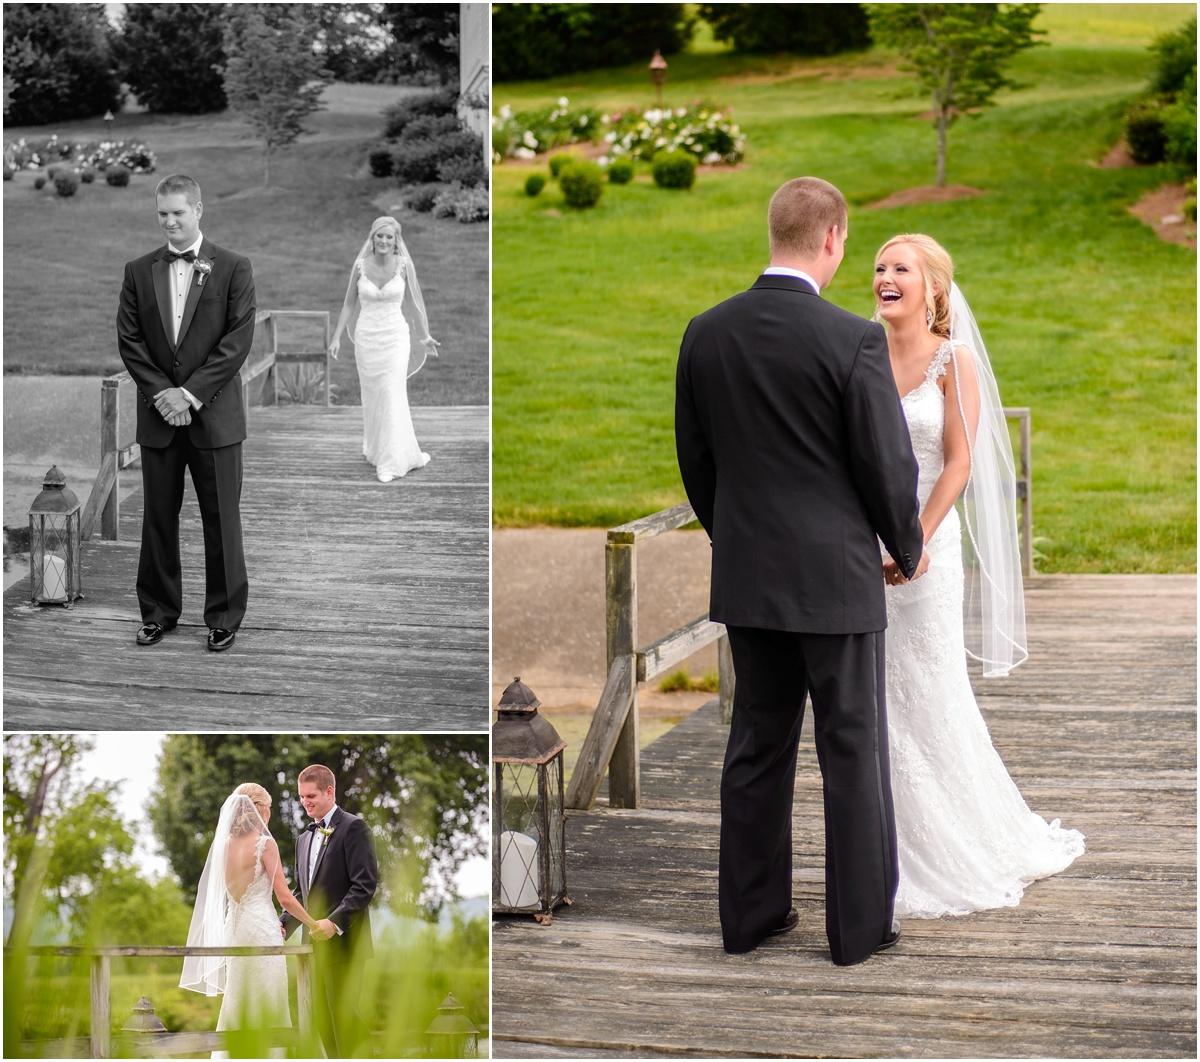 Greg Smit Photography Mint Springs Farm Nashville Tennessee wedding photographer_0361